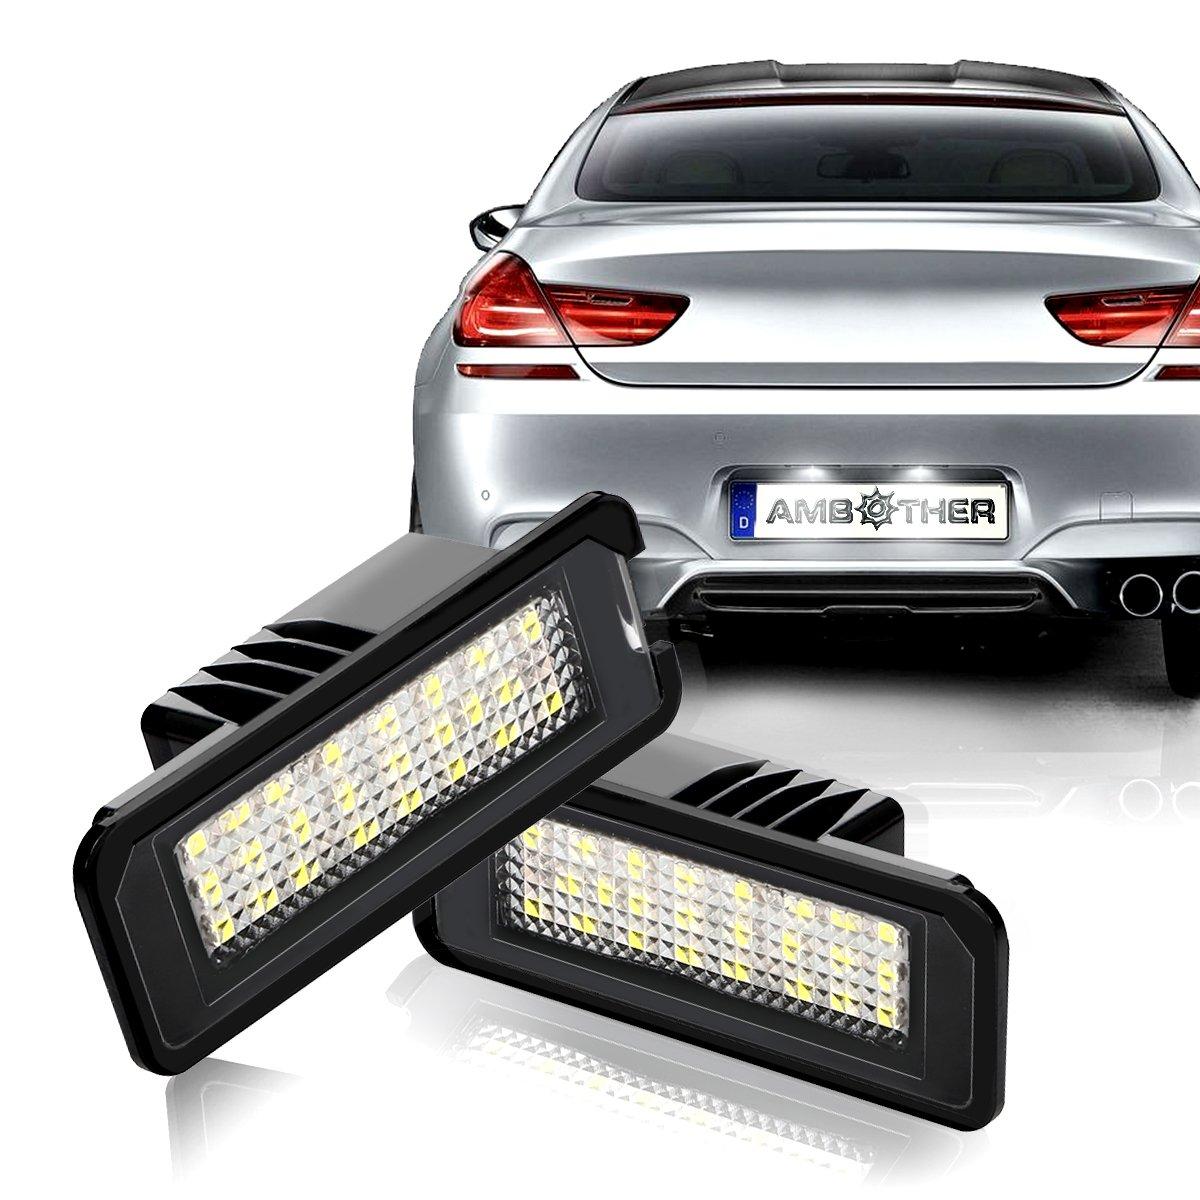 Ambother, iluminación LED para matrícula, Golf 4/5/6, Passat, Polo: Amazon.es: Coche y moto